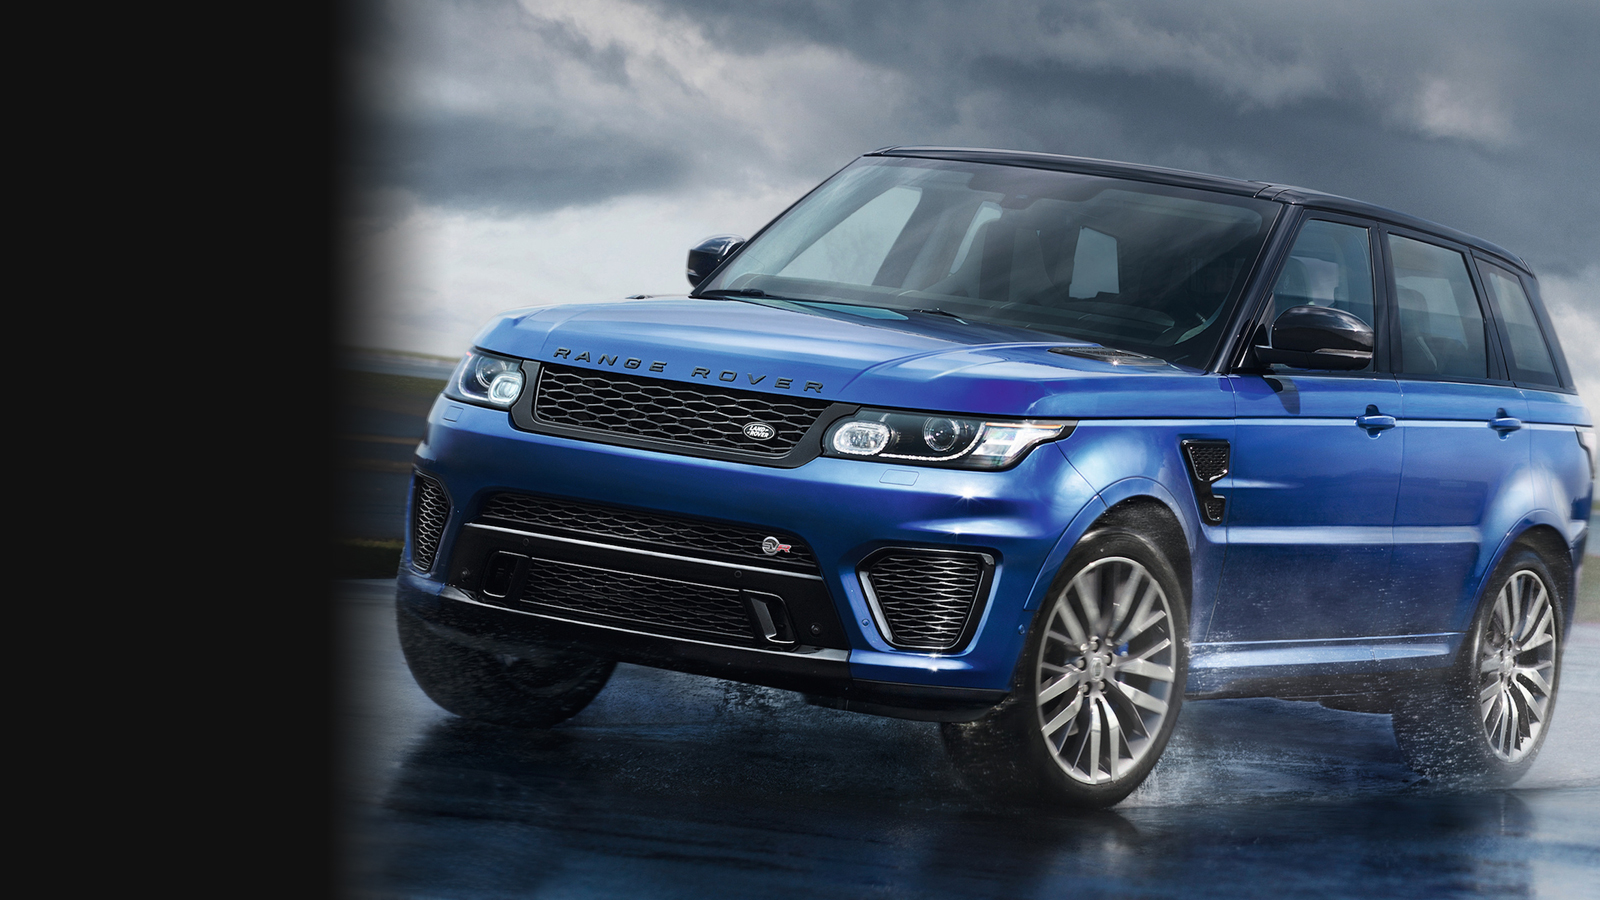 Range Rover Dealerships Land Rover Dealer In Phoenix Land Rover North Scottsdale